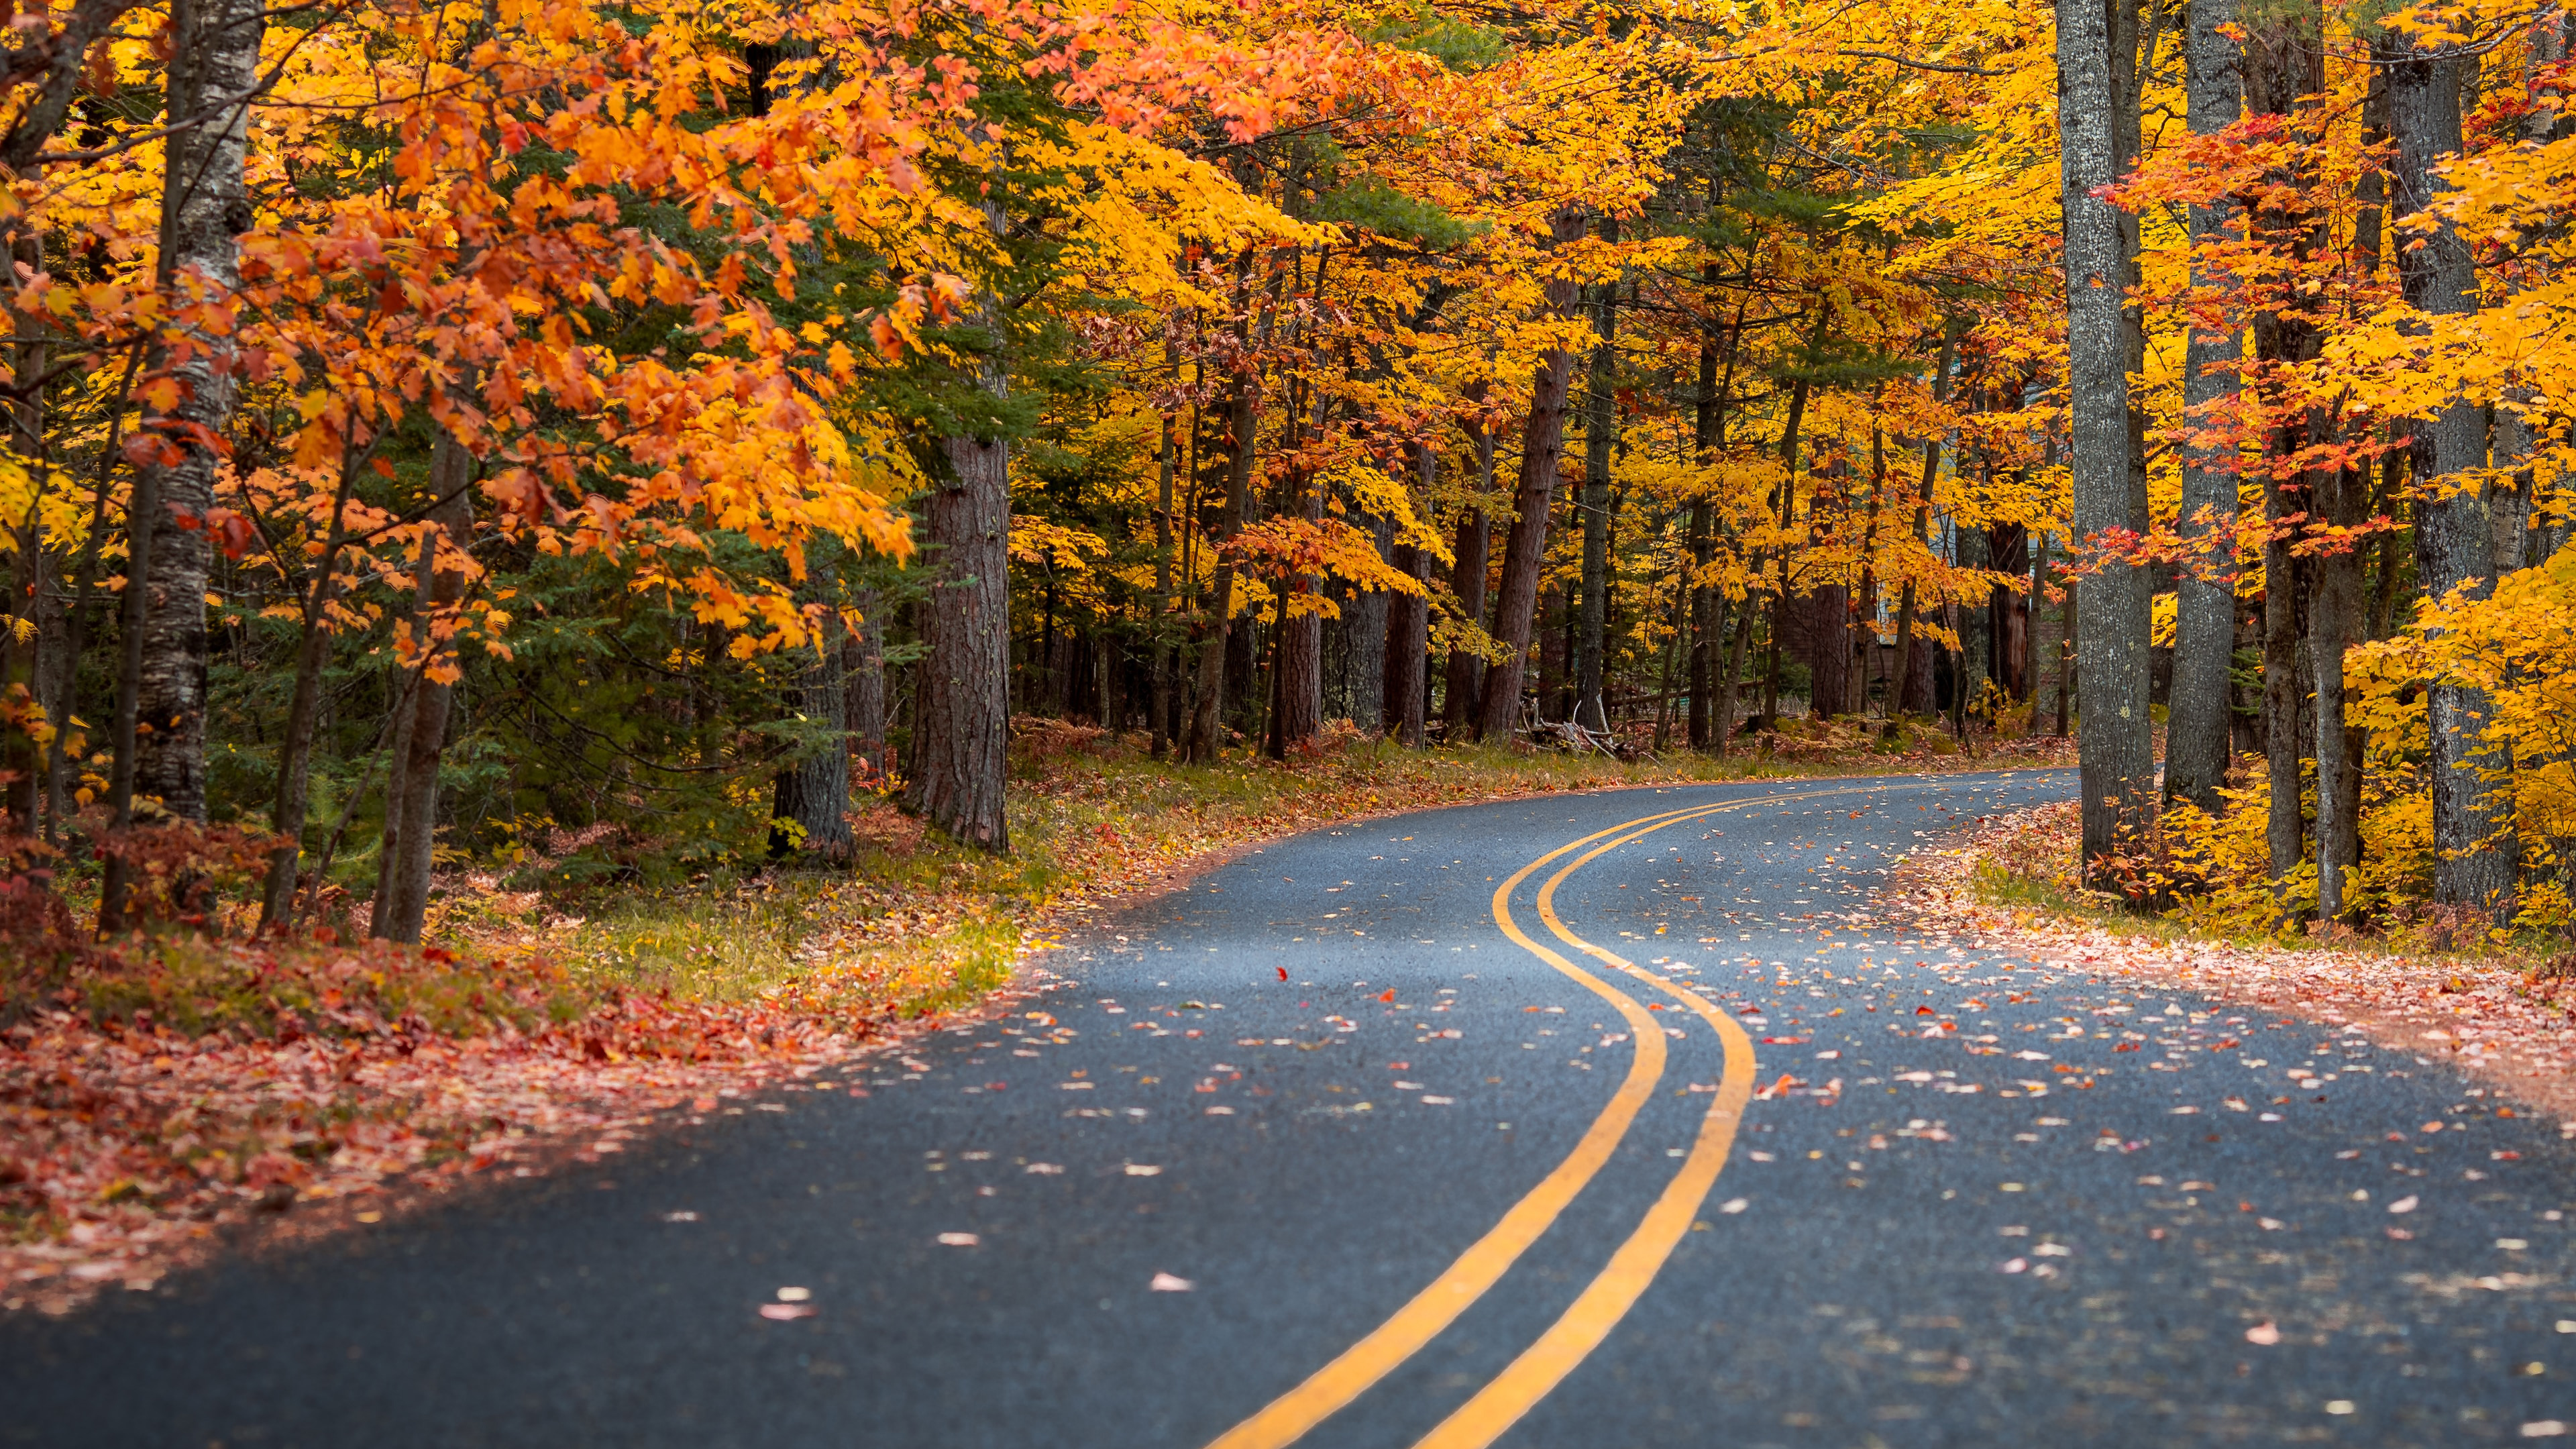 autumn drive road 1574938577 - Autumn Drive Road -